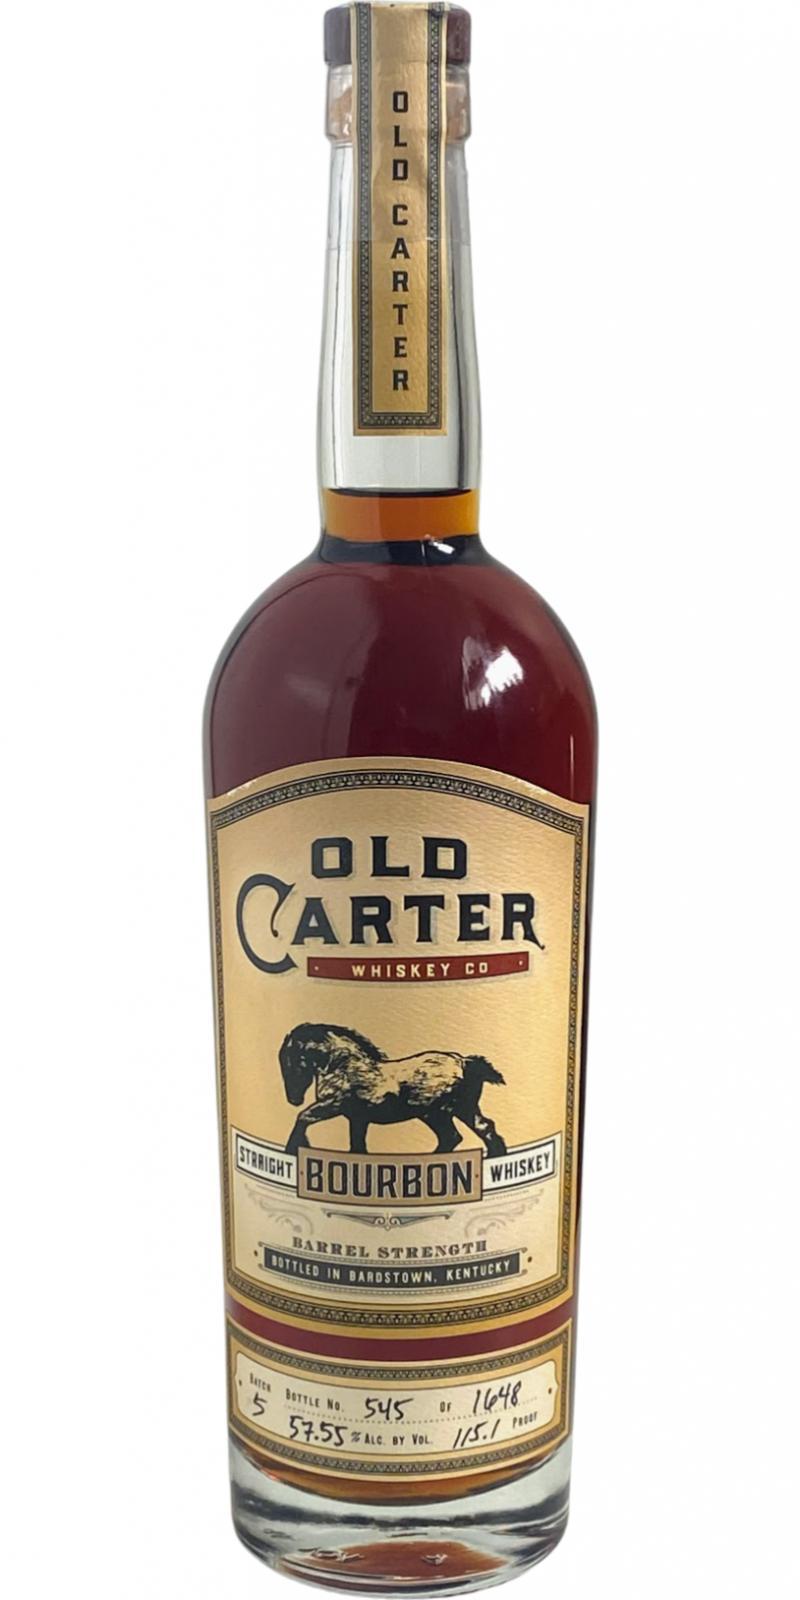 Old Carter Straight Bourbon Whiskey